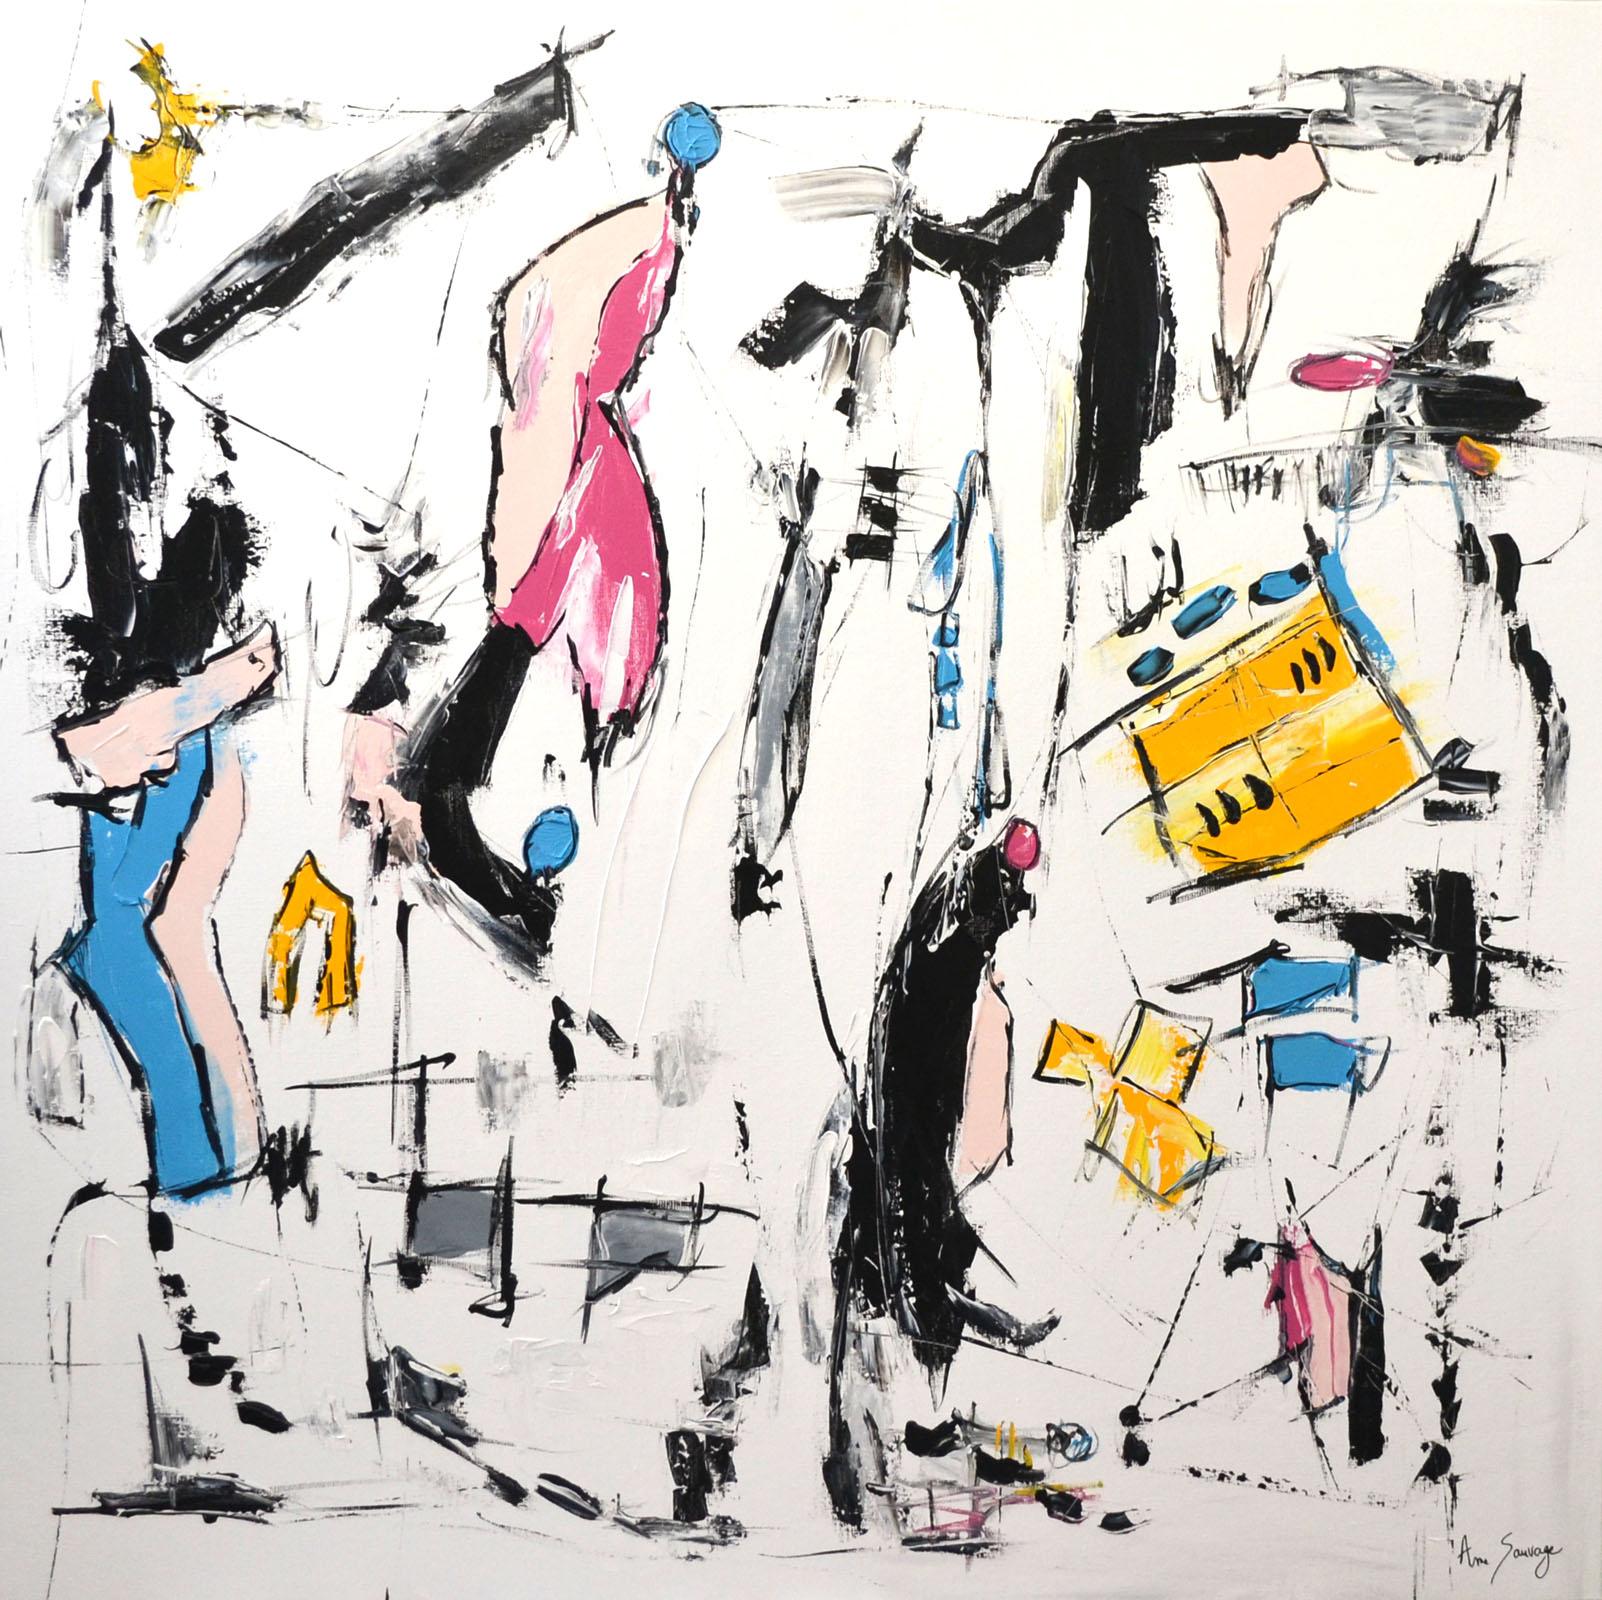 grand tableau moderne d'artiste